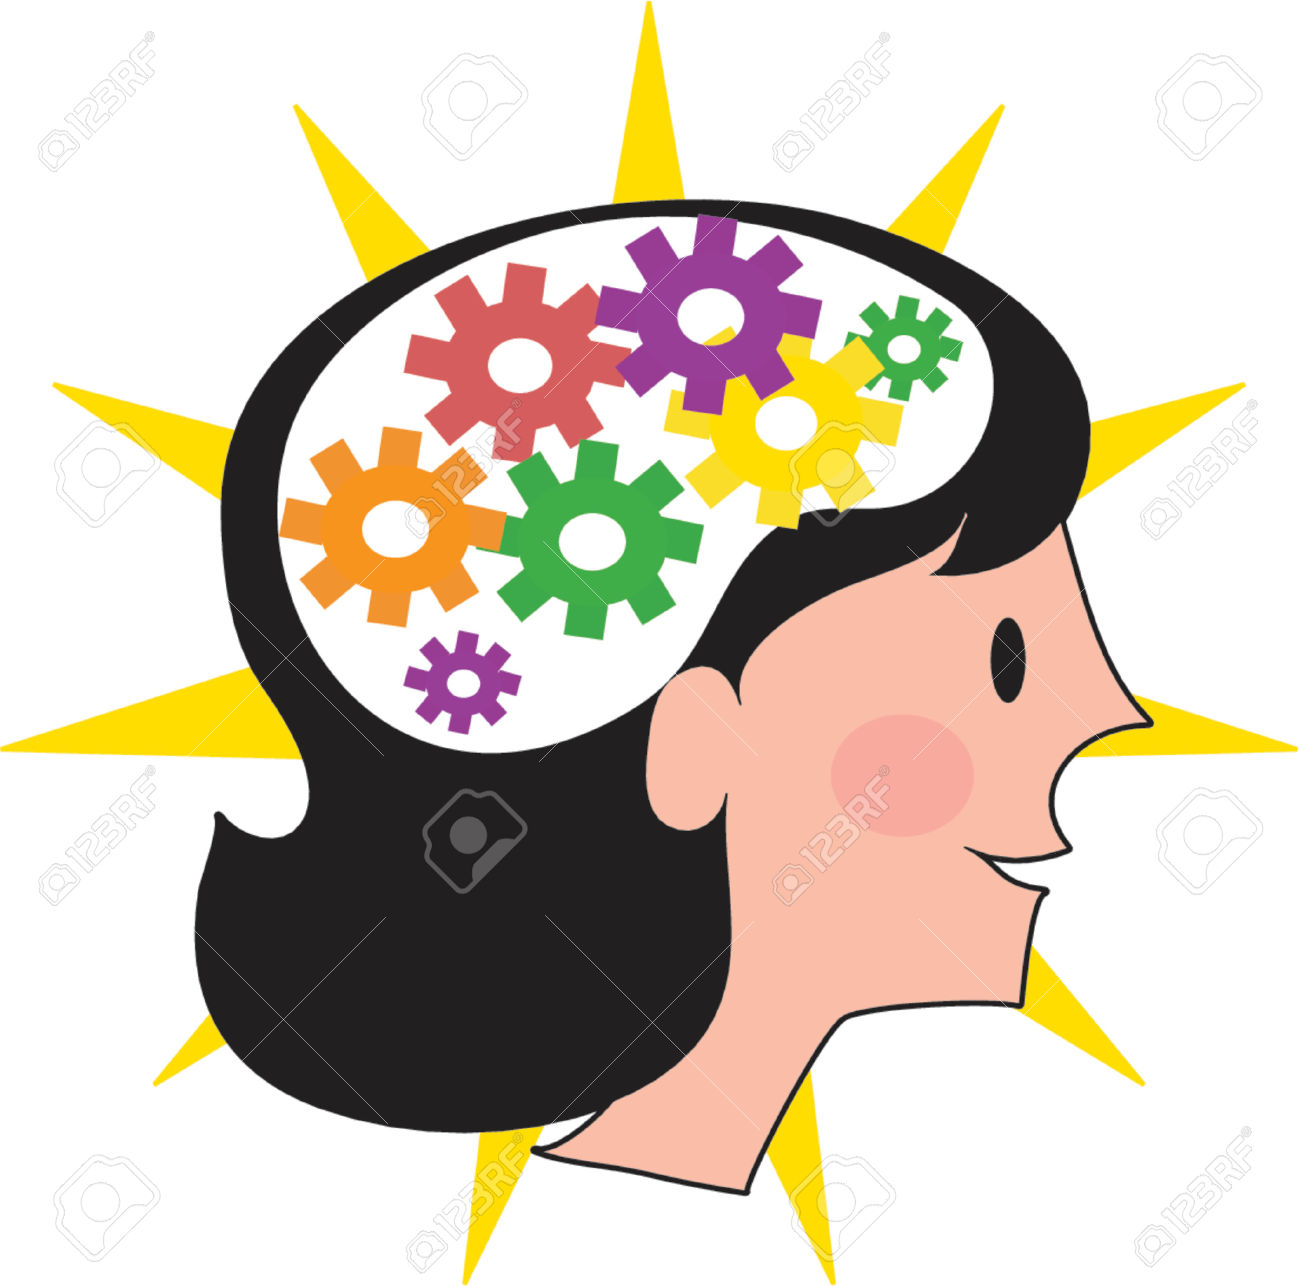 Smart brain clipart 8 » Clipart Station.